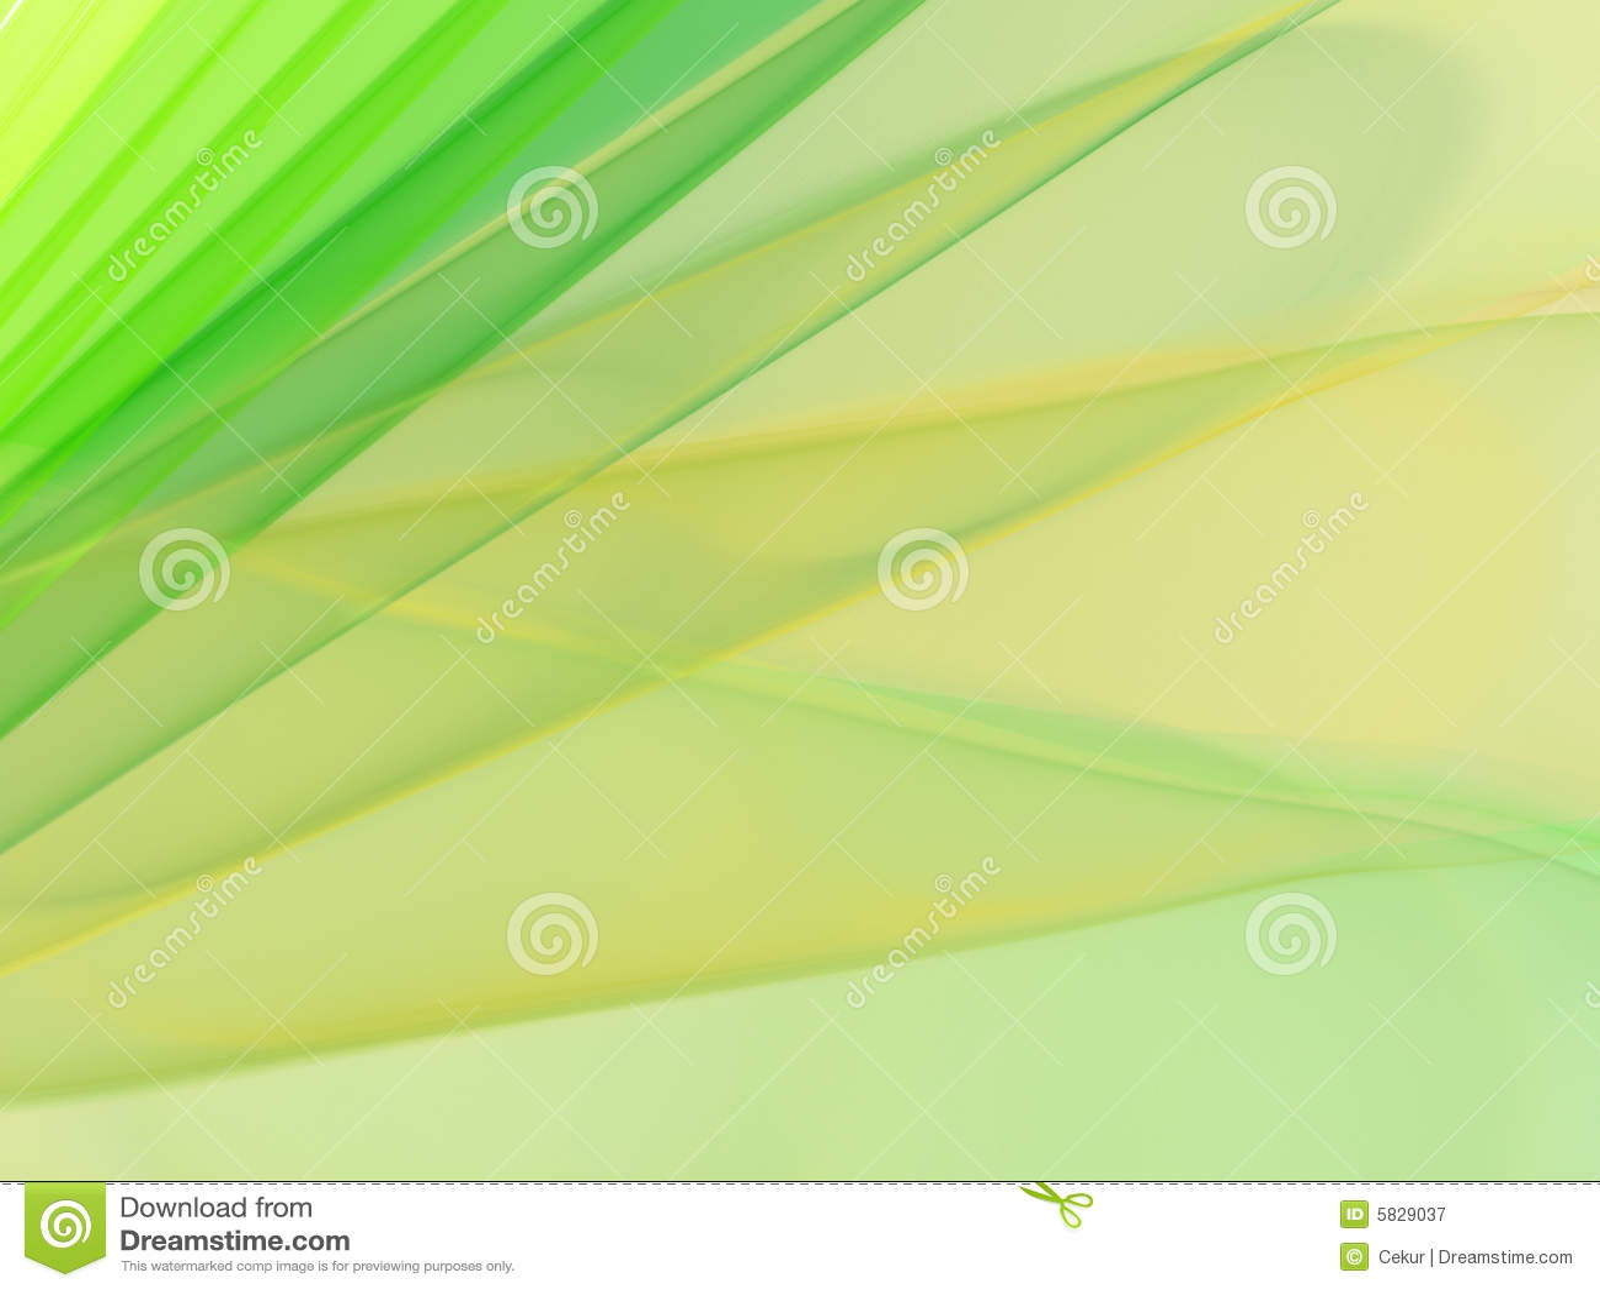 elegant green backgrounds - photo #11